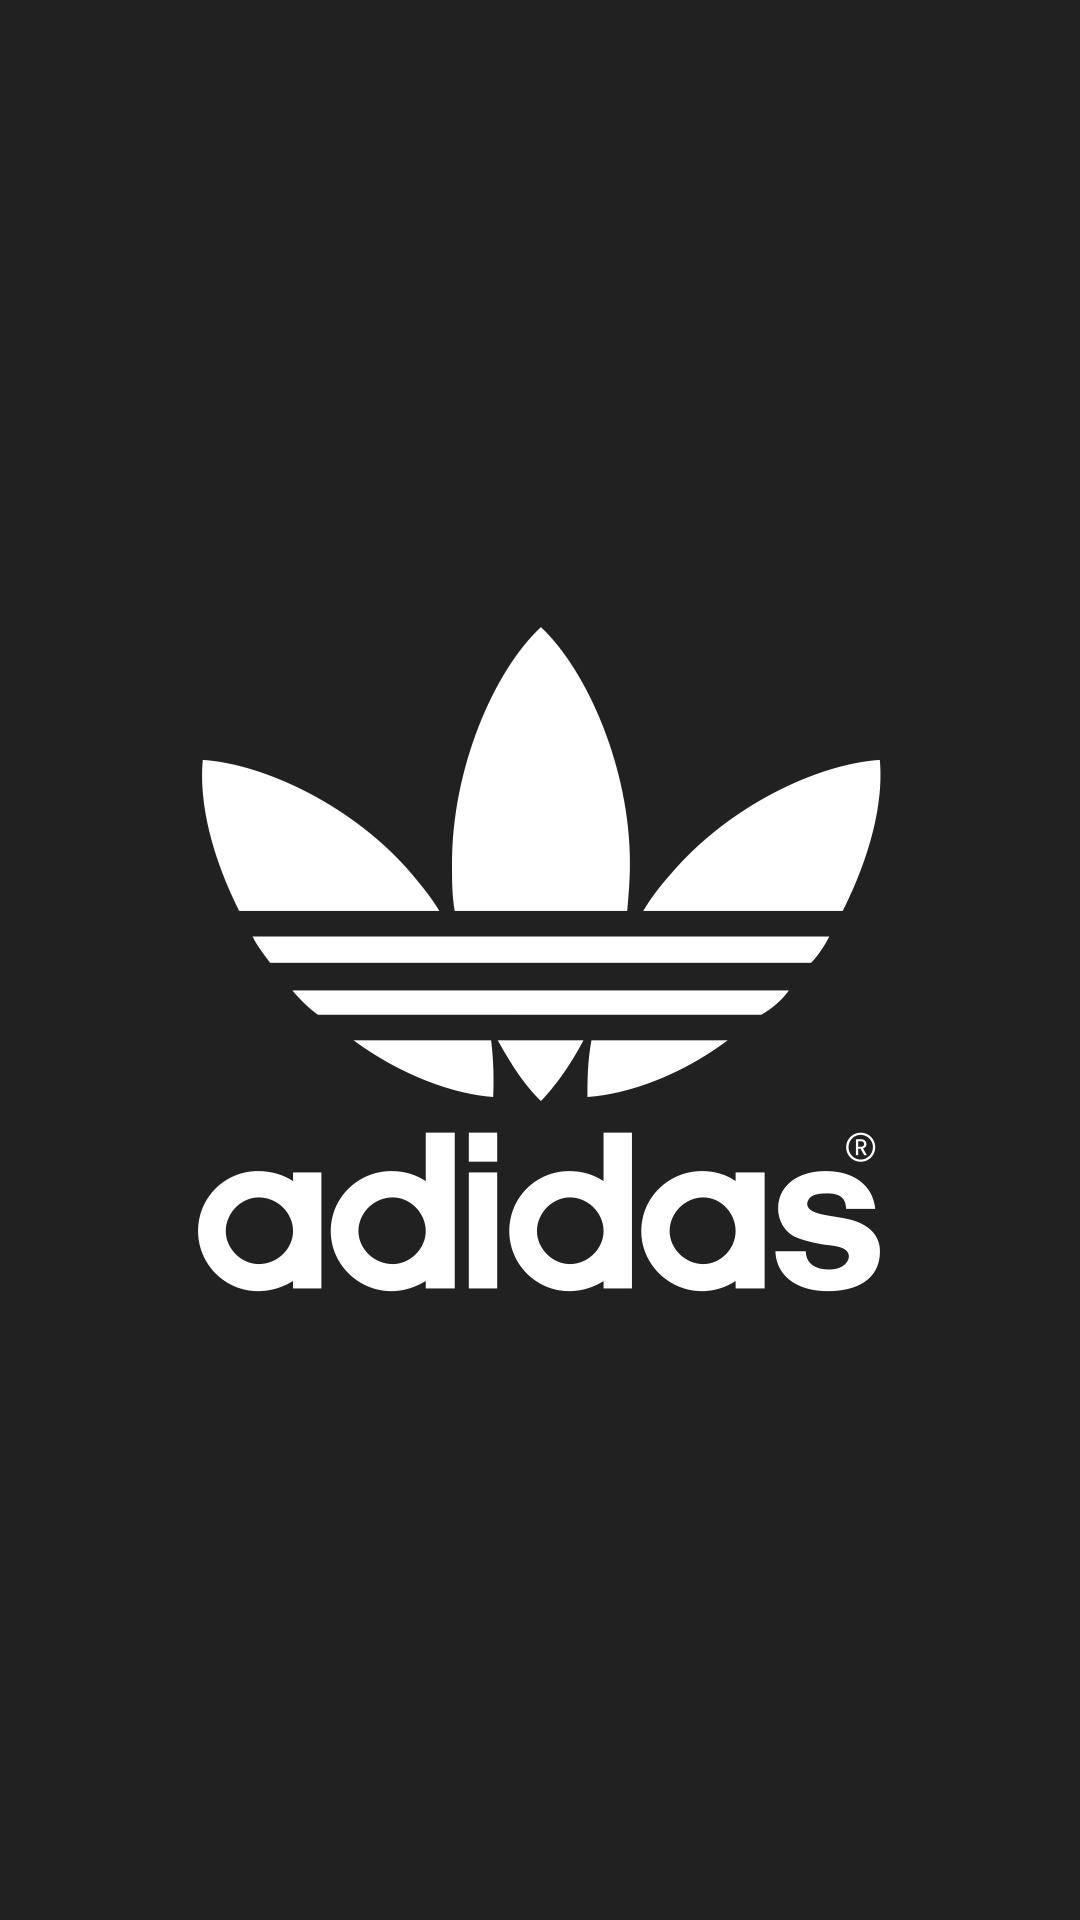 Adidas Logo Iphone Wallpaper Adidas ロゴ アディダス壁紙 アディダス